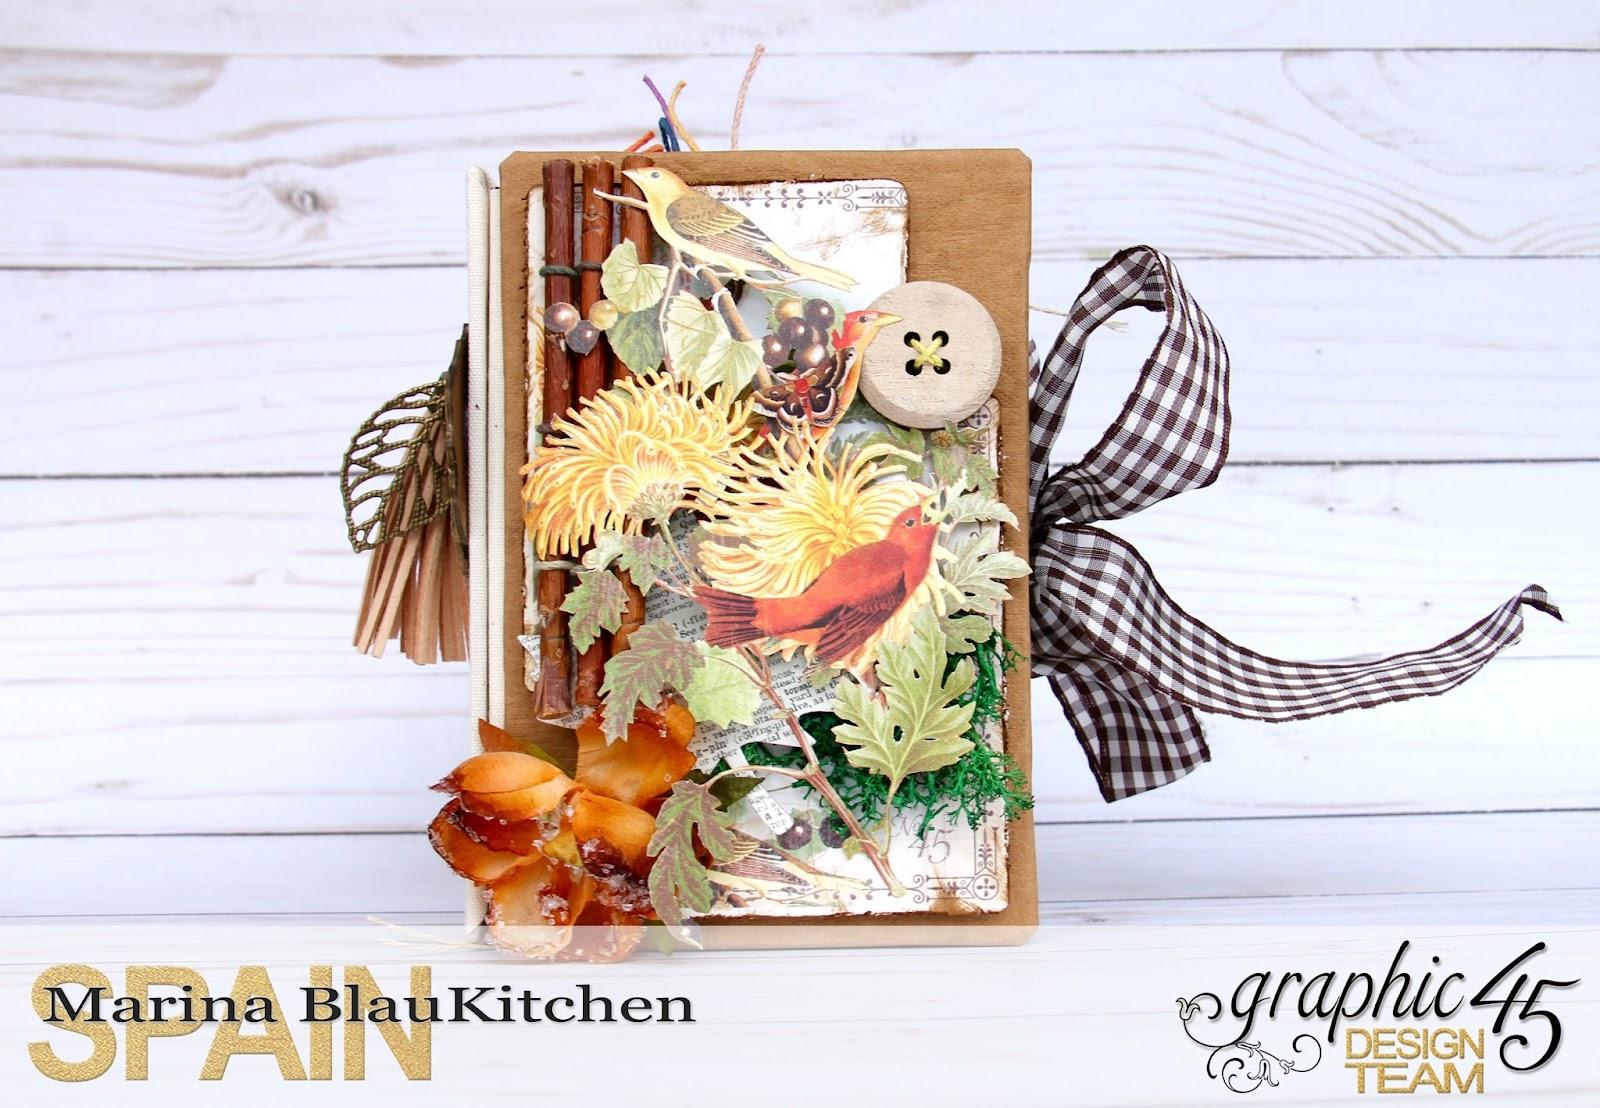 Four seasons Autumn Album by Marina Blaukitchen Product by Graphic 45 photo 5.jpg